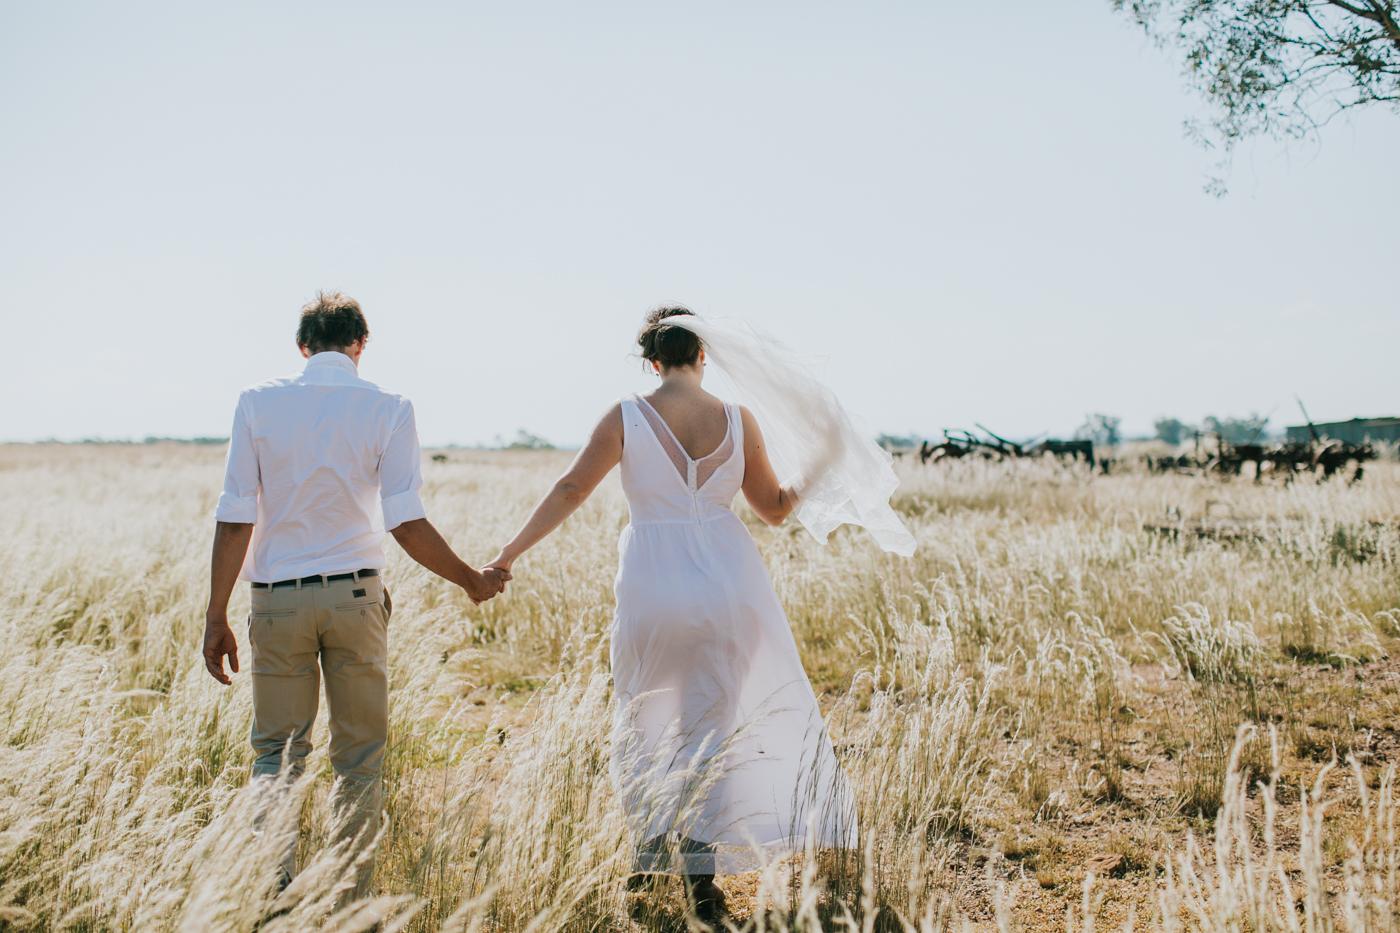 Nicolle & Jacob - Dubbo Wedding - Country Australia - Samantha Heather Photography-157.jpg